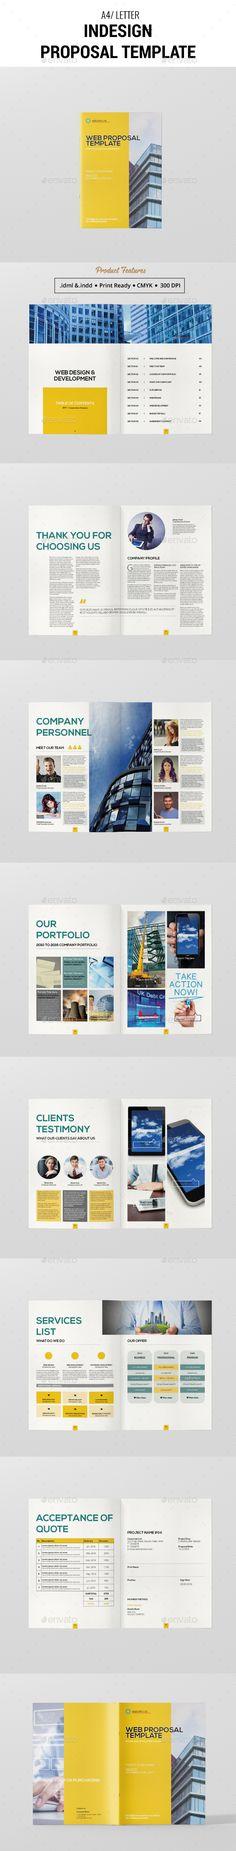 Cloud Sever Proposal Template Template, Proposals and Customize - interior design proposal template